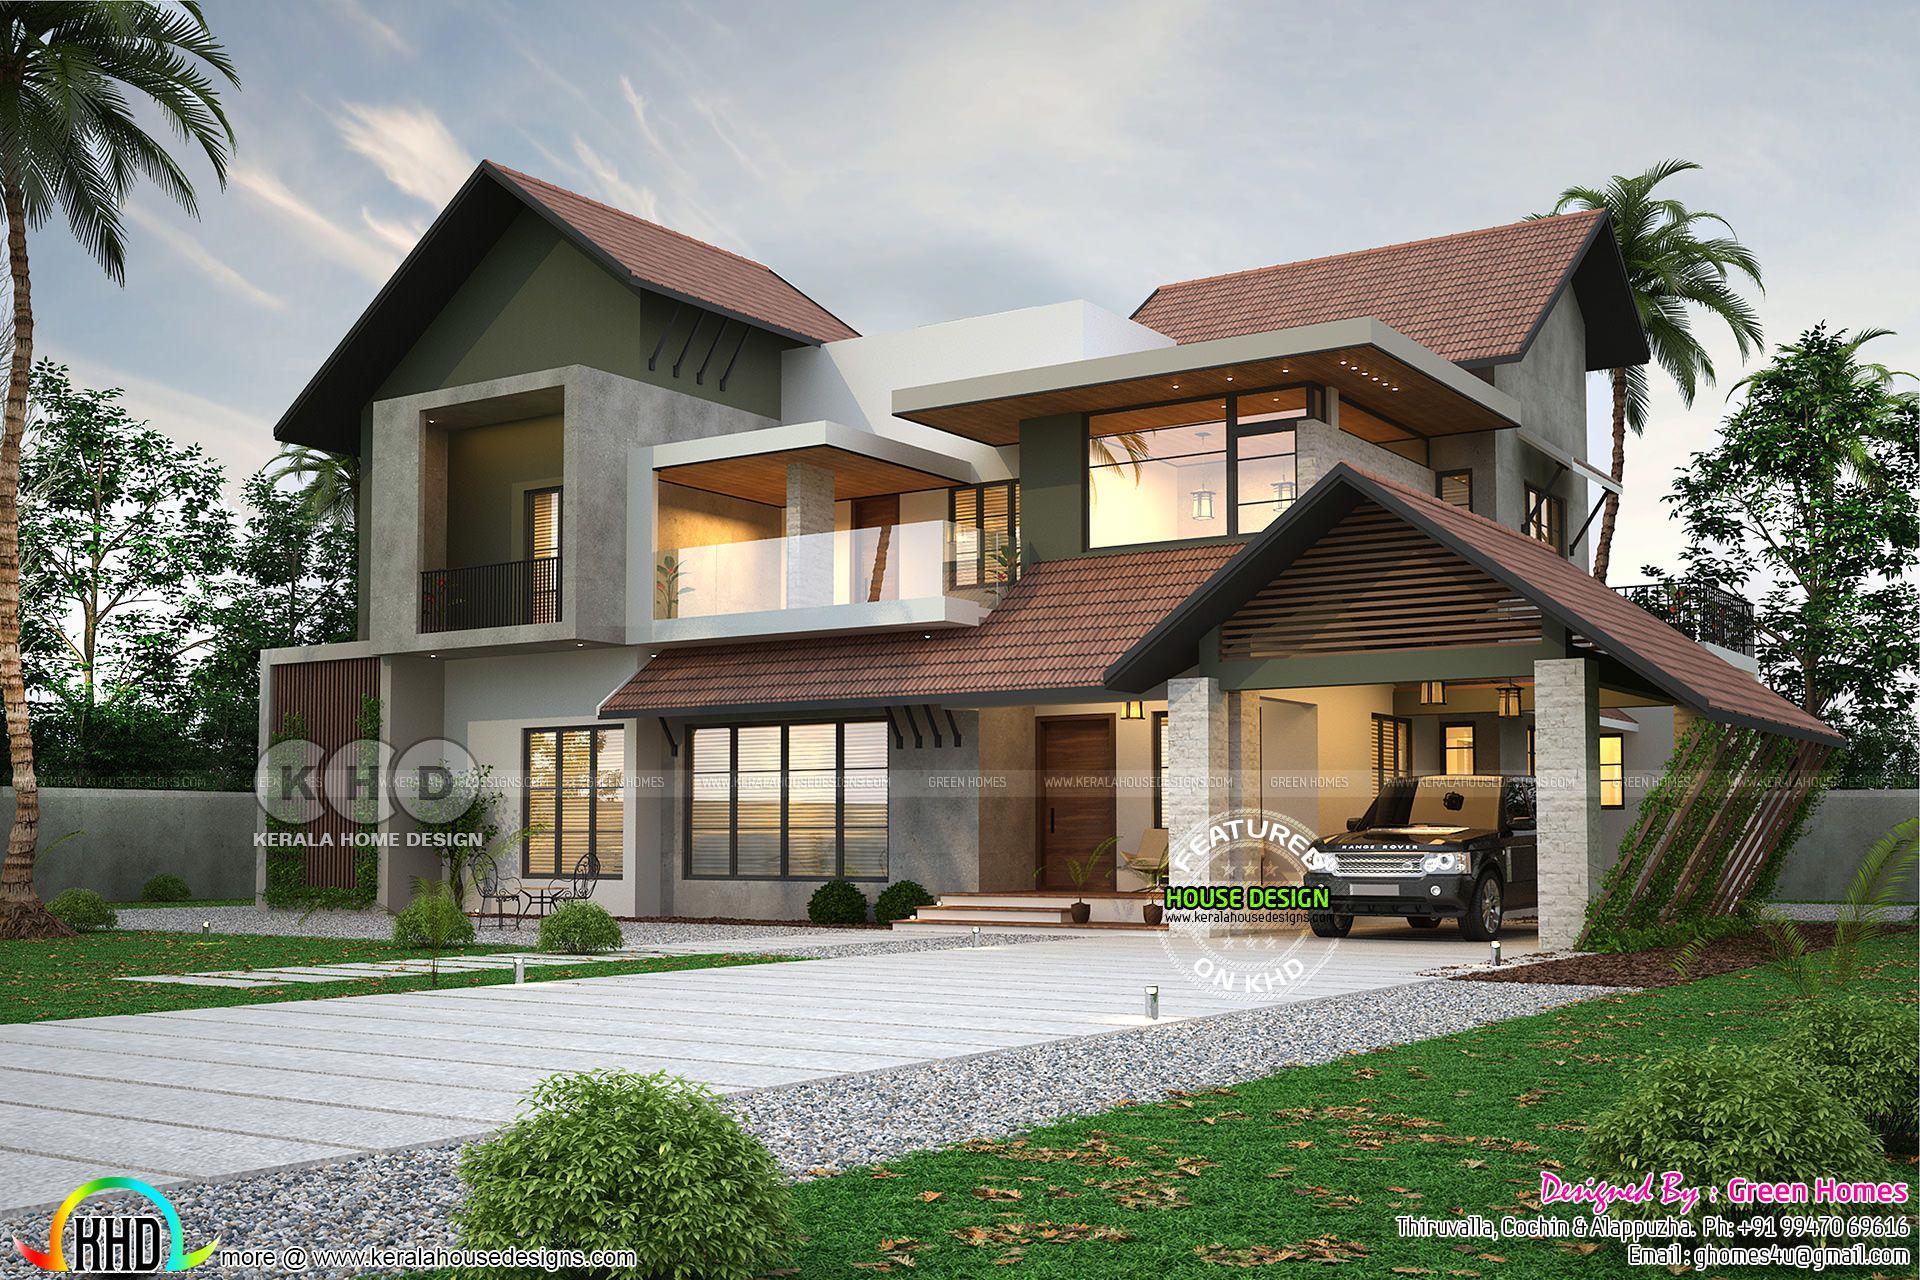 Sweet Modern Kerala Home Design Kerala House Design Village House Design House Roof Design